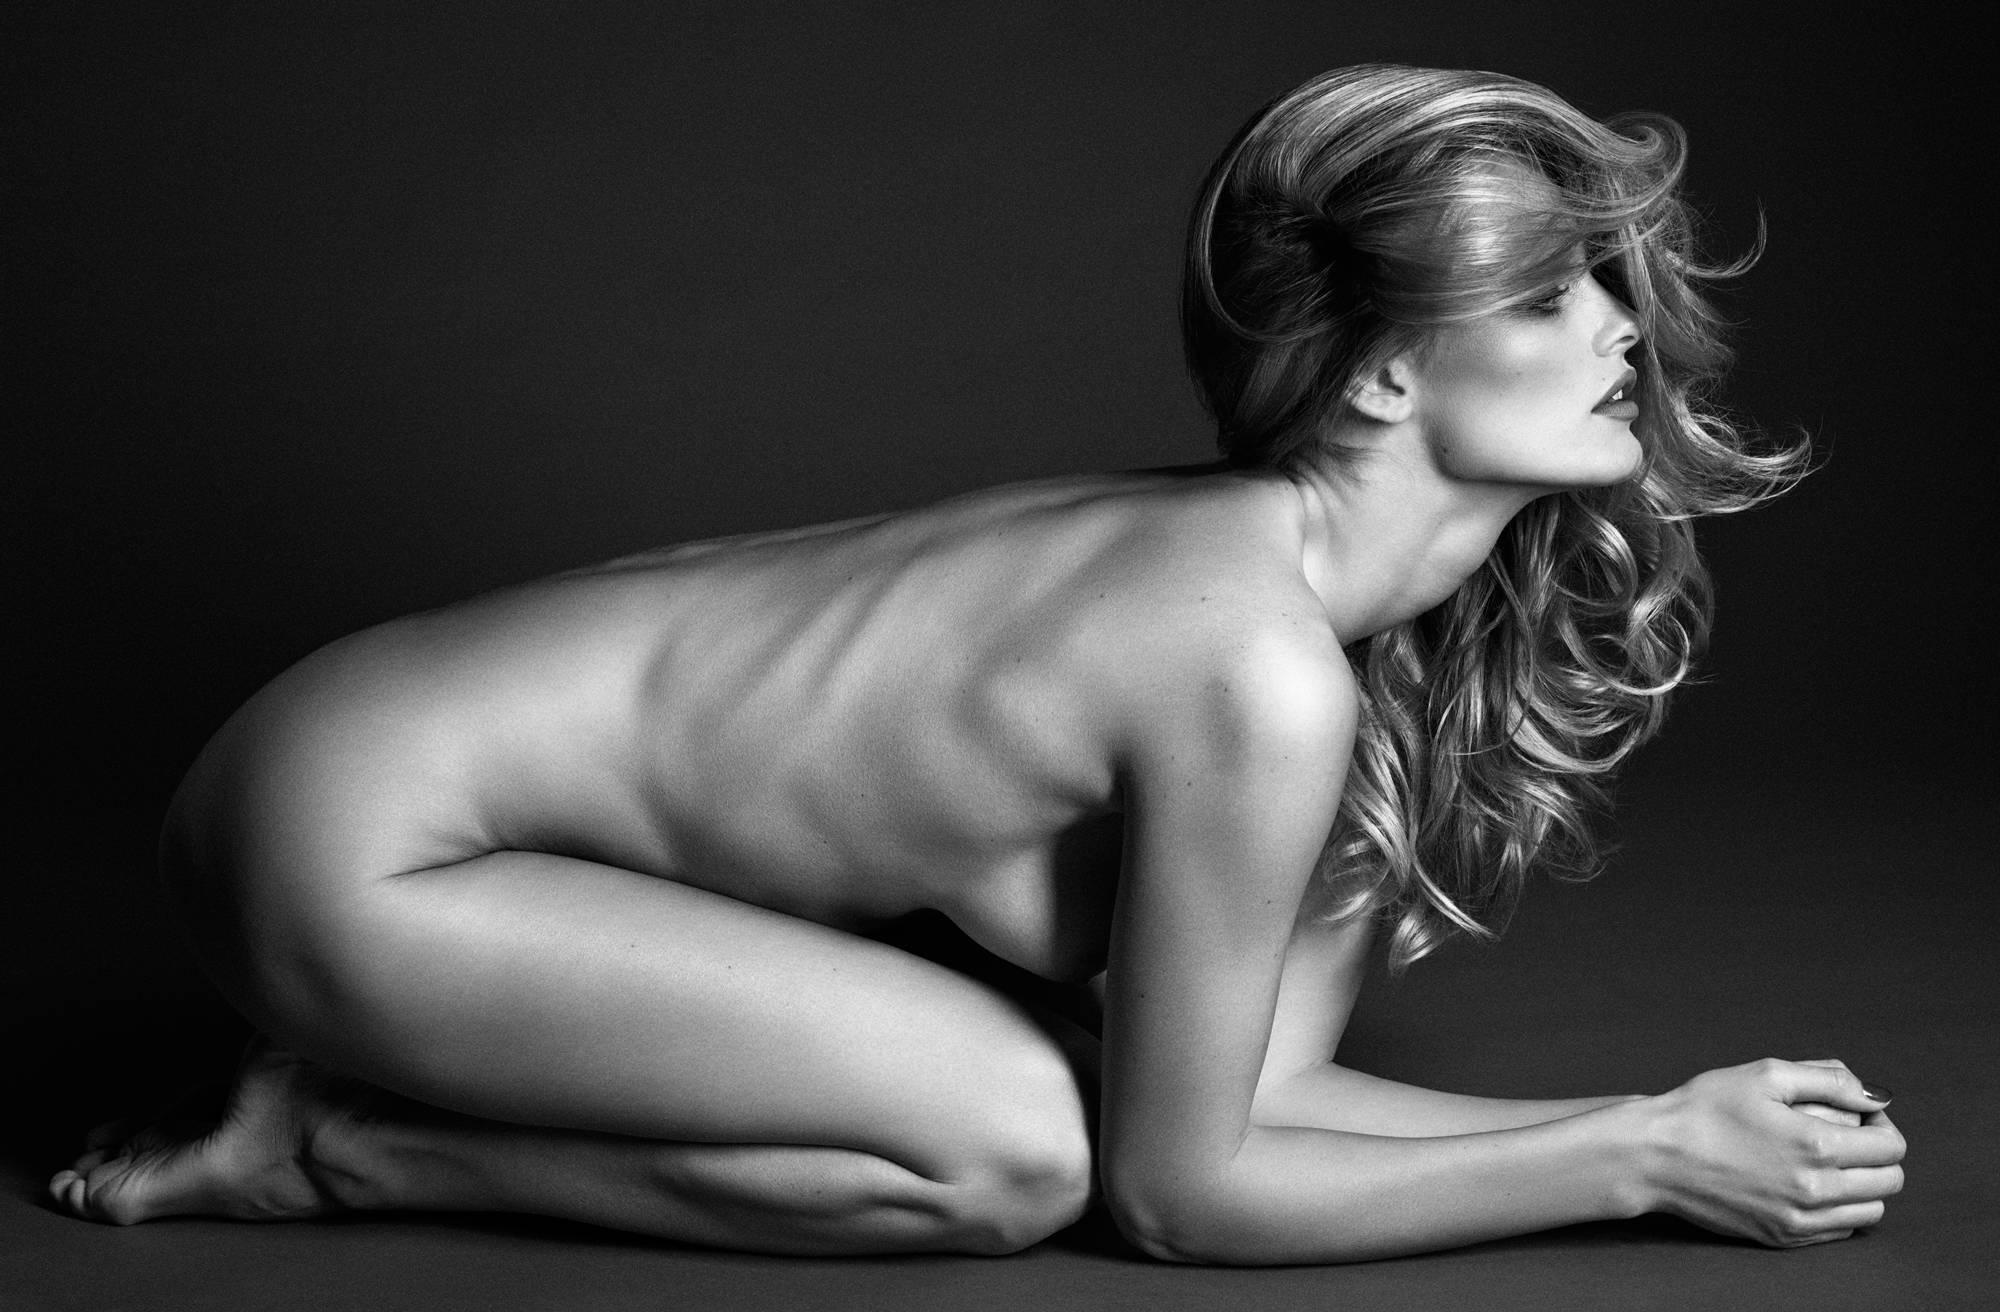 nude-supermodels-pics